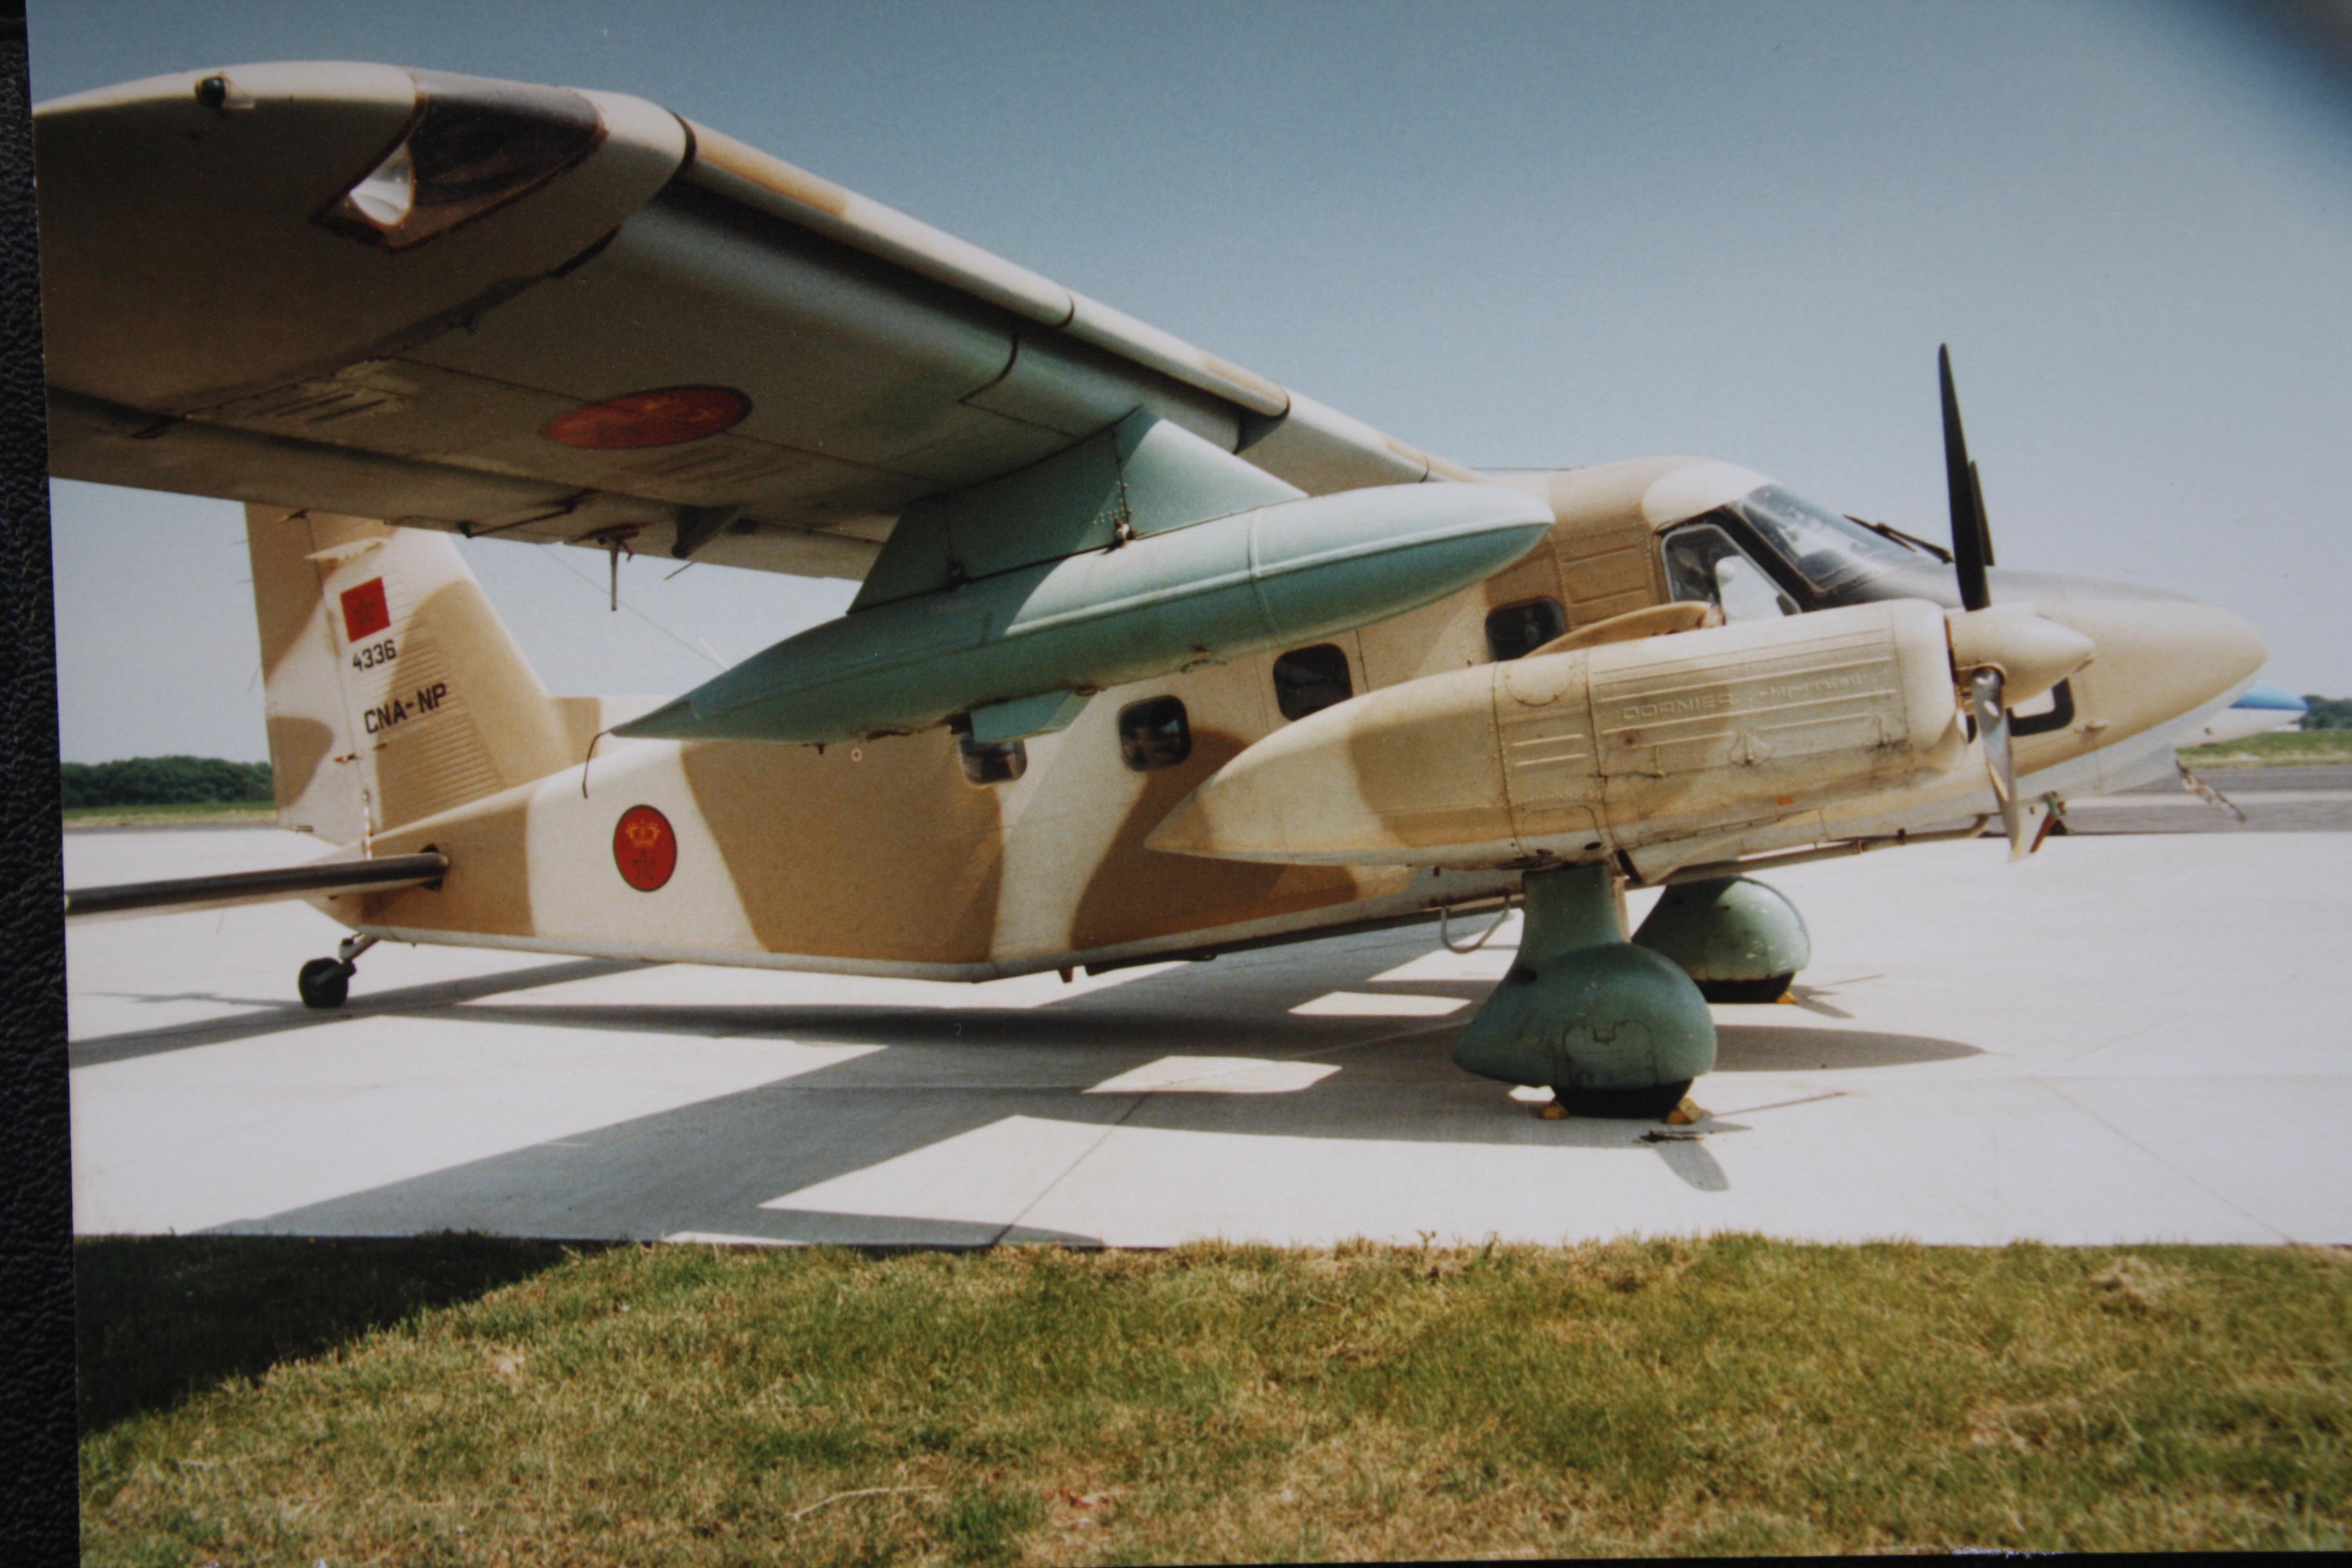 FRA: Photos anciens avions des FRA - Page 10 27154767207_a8b760d2ca_o